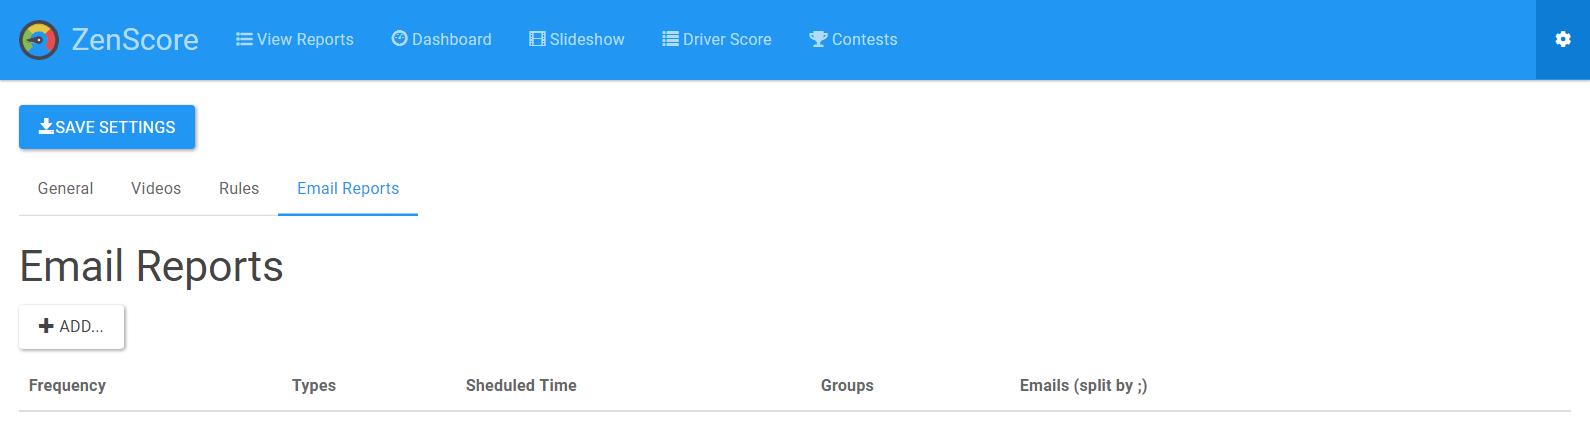 ZenScore Email Reports